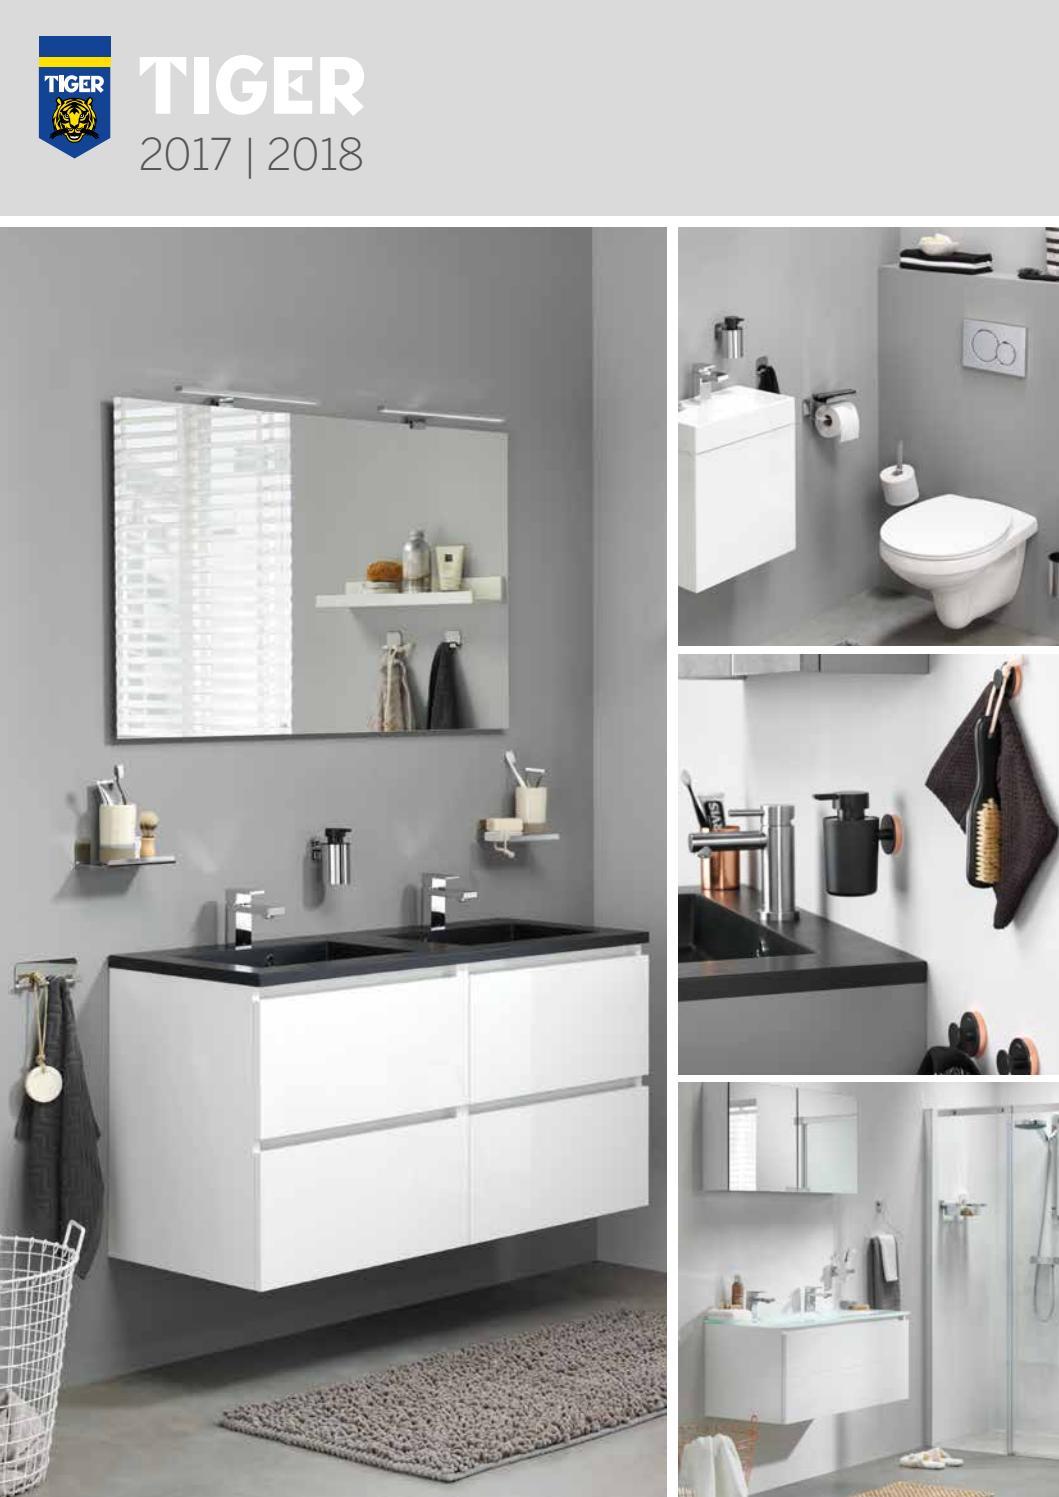 Tiger Bathroom Design Magazine 2017 2018 Nl F By Tiger